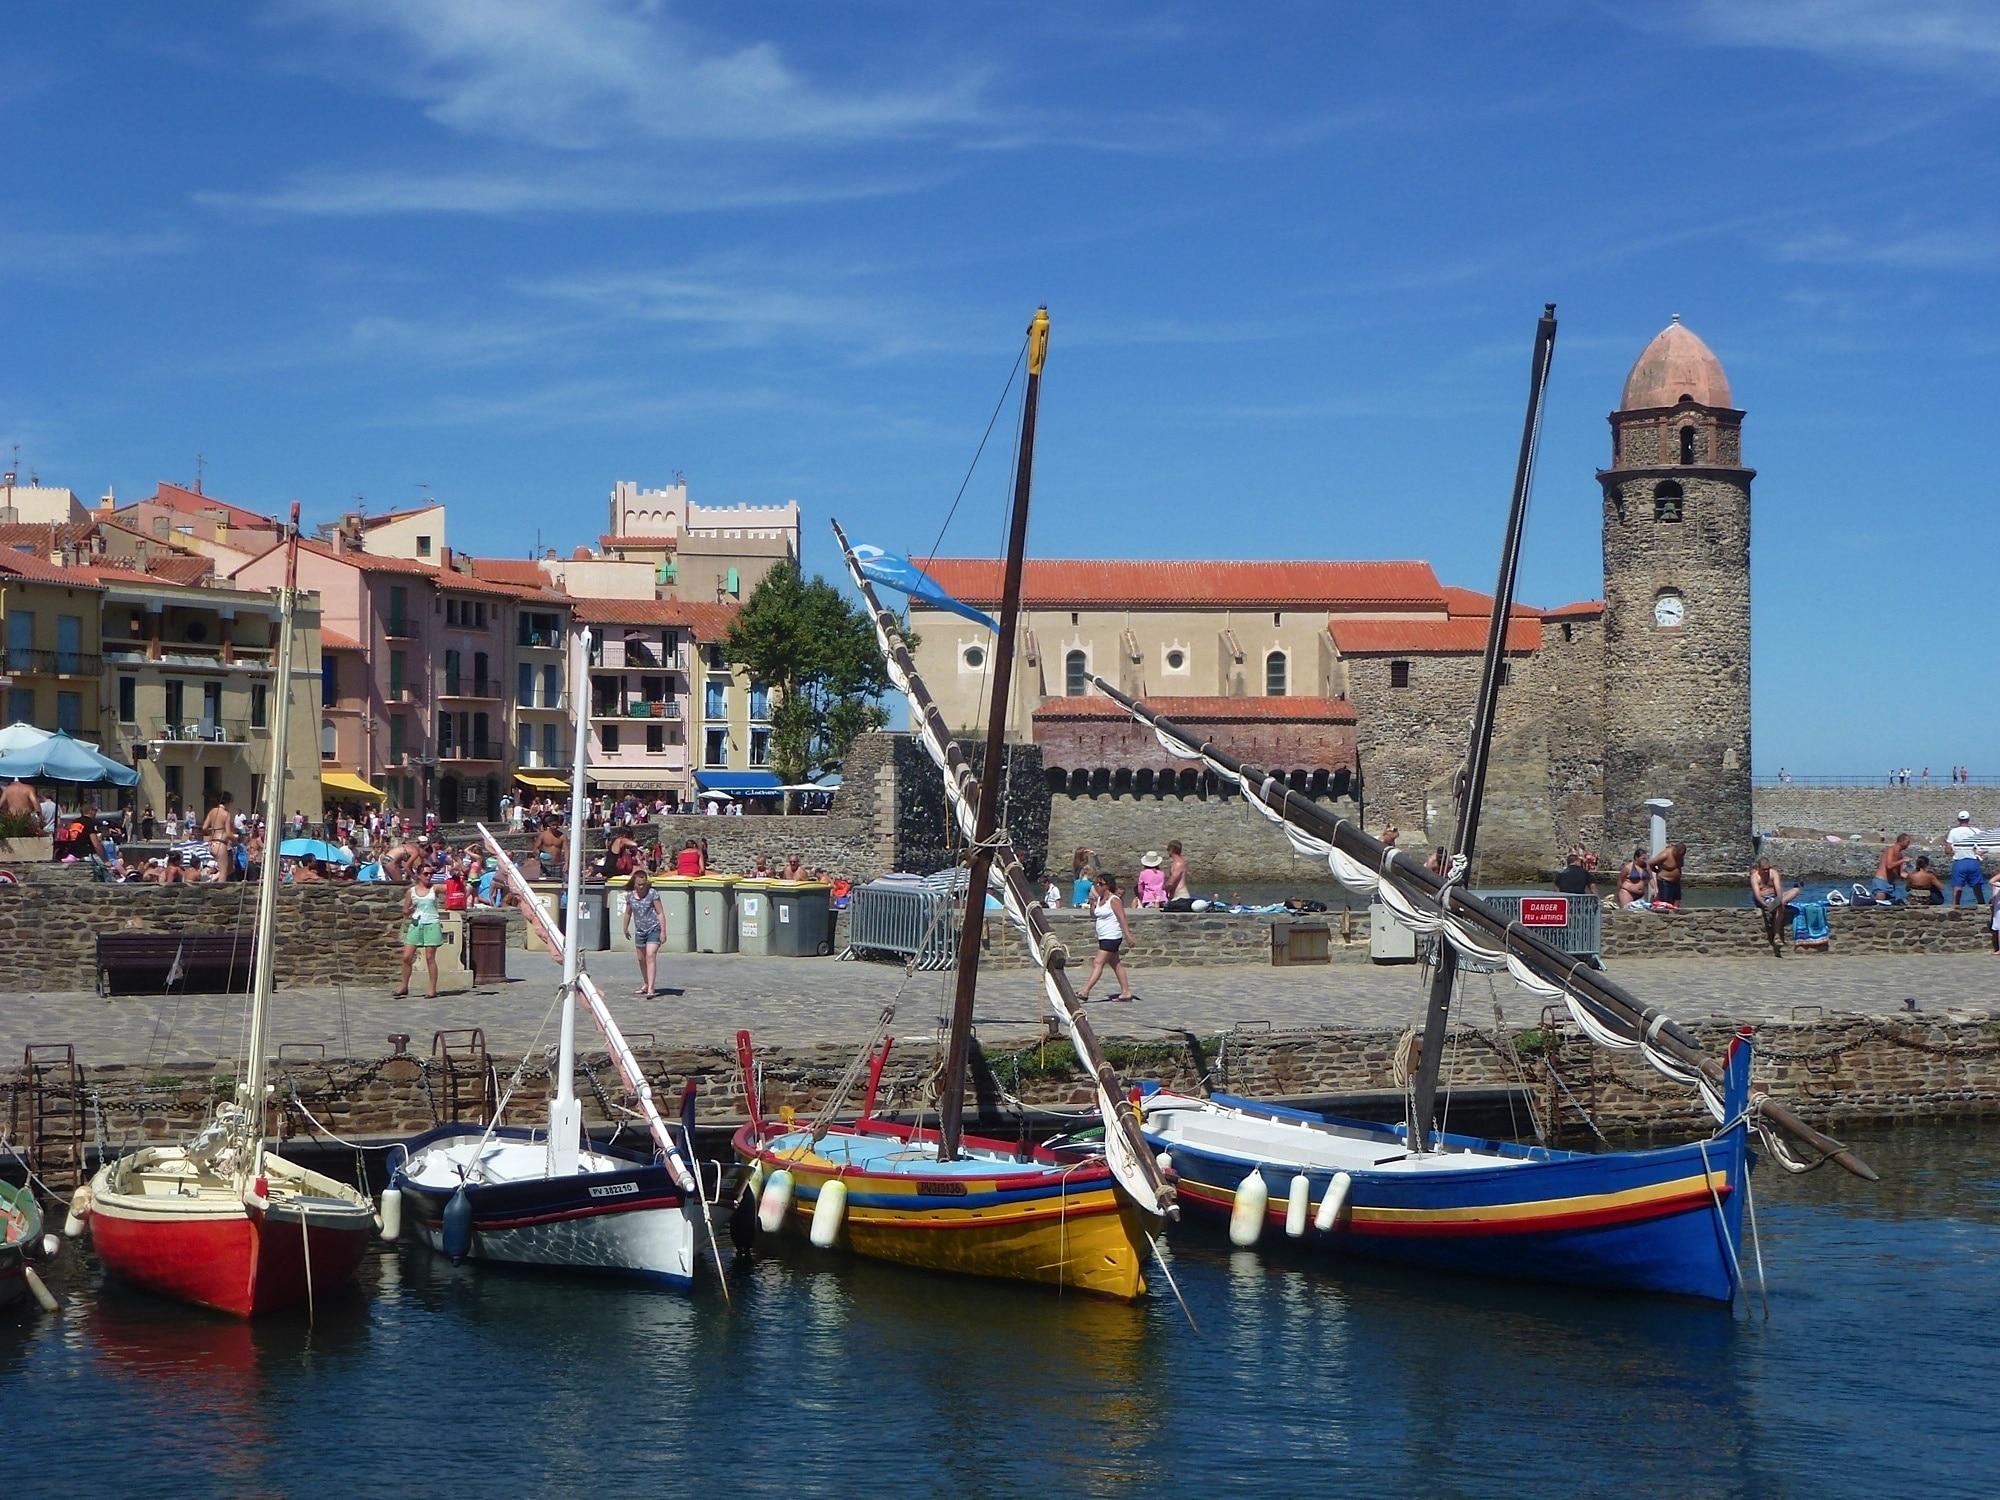 Collioure, Pyrenees-Orientales, France